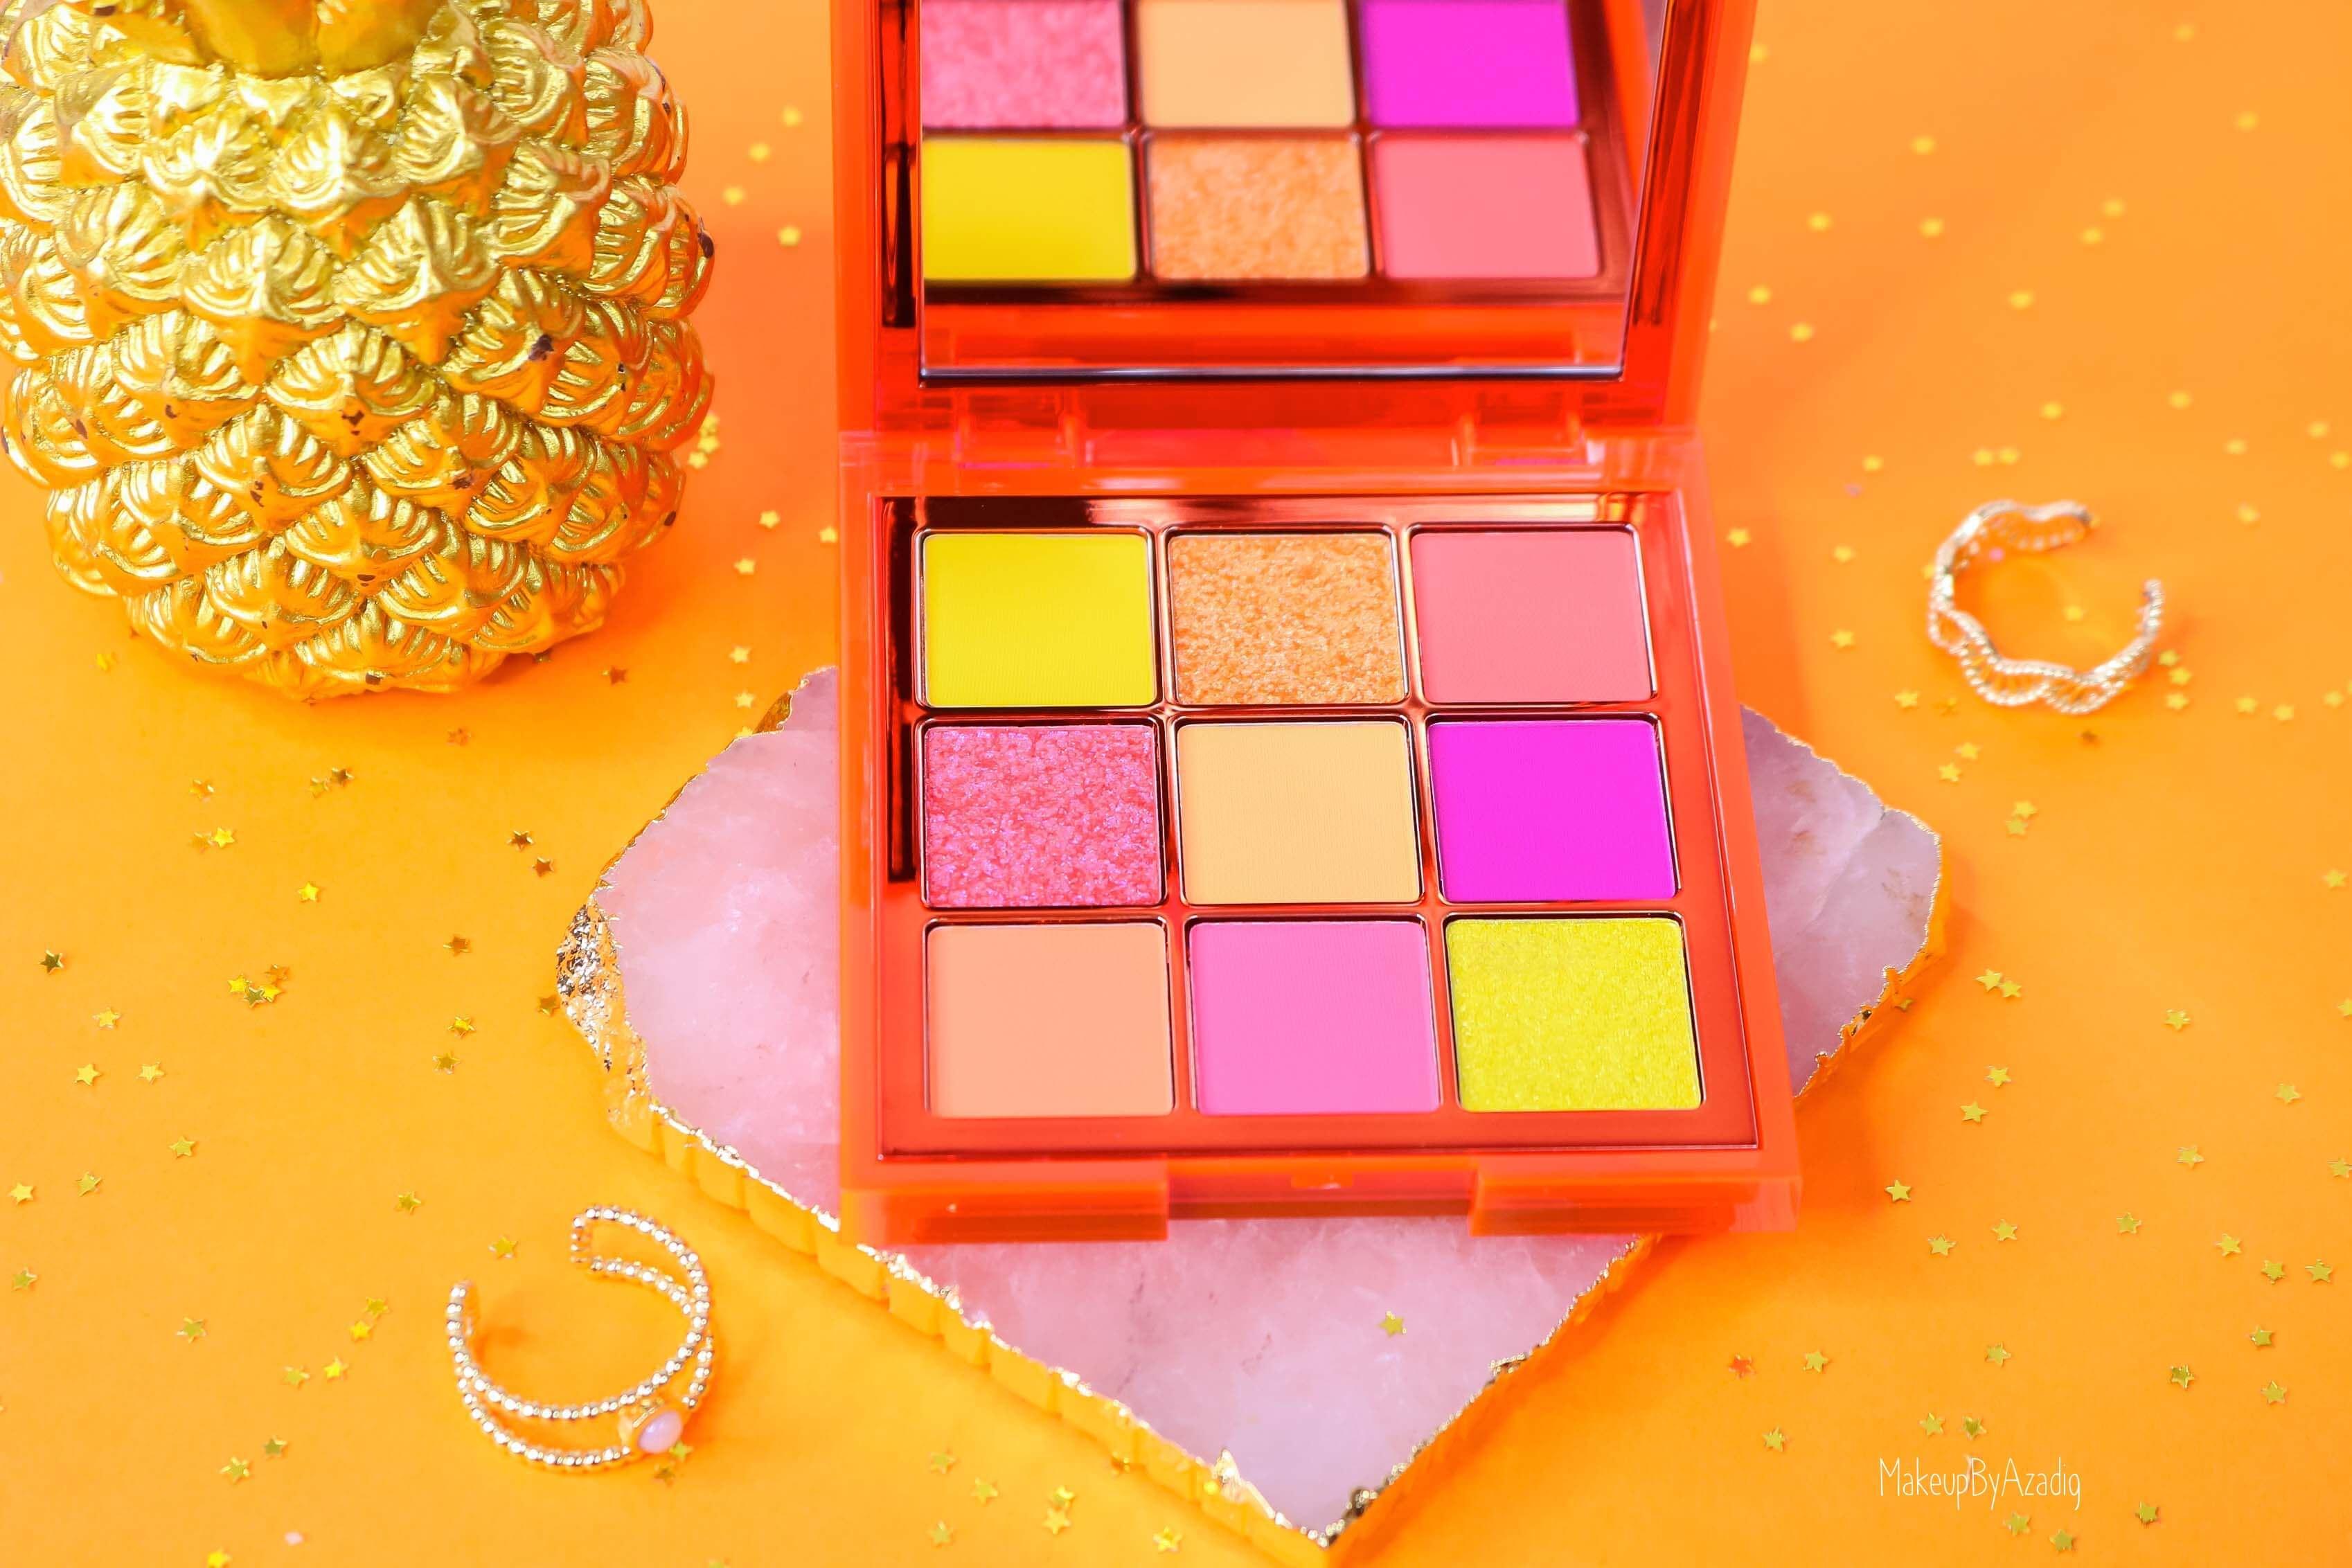 revue-review-palette-neon-obsession-huda-beauty-orange-pink-green-neon-palette-fard-paupieres-fluo-swatch-avis-prix-makeupbyazadig-teintes